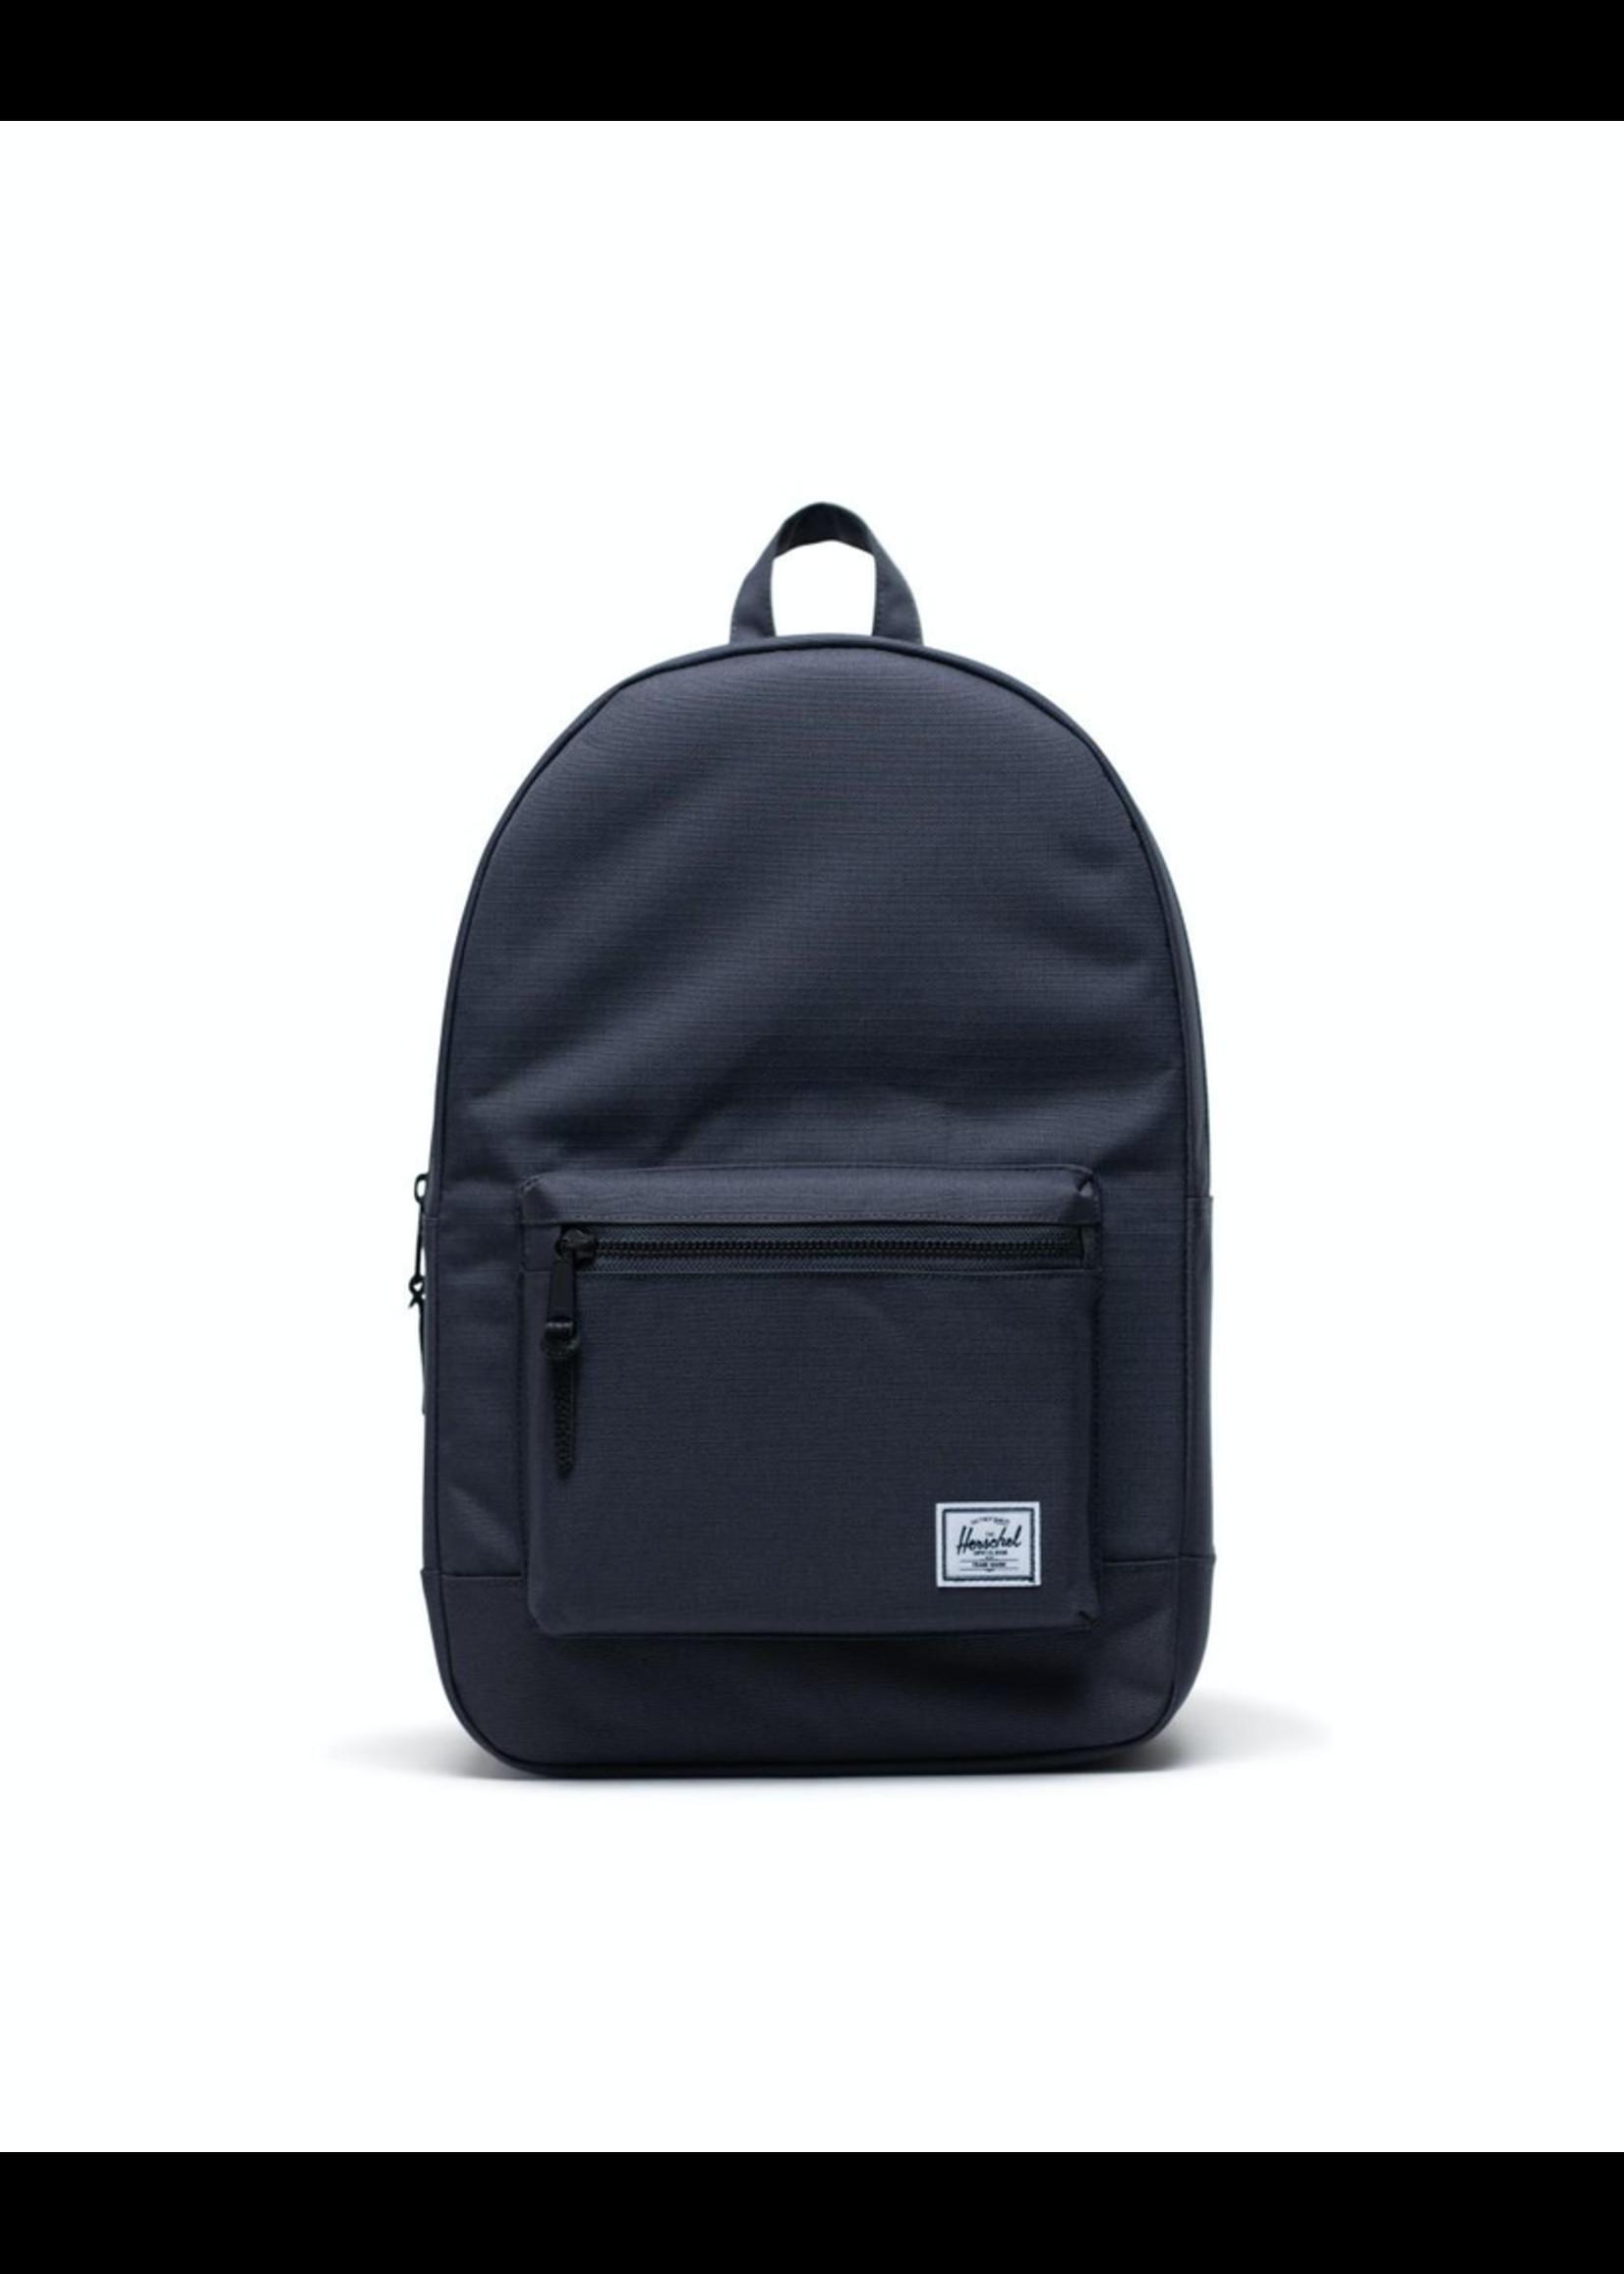 Herschel Supply Co. Herschel Supply, Classic Backpack | XL in Periscope Ripstop, 30L